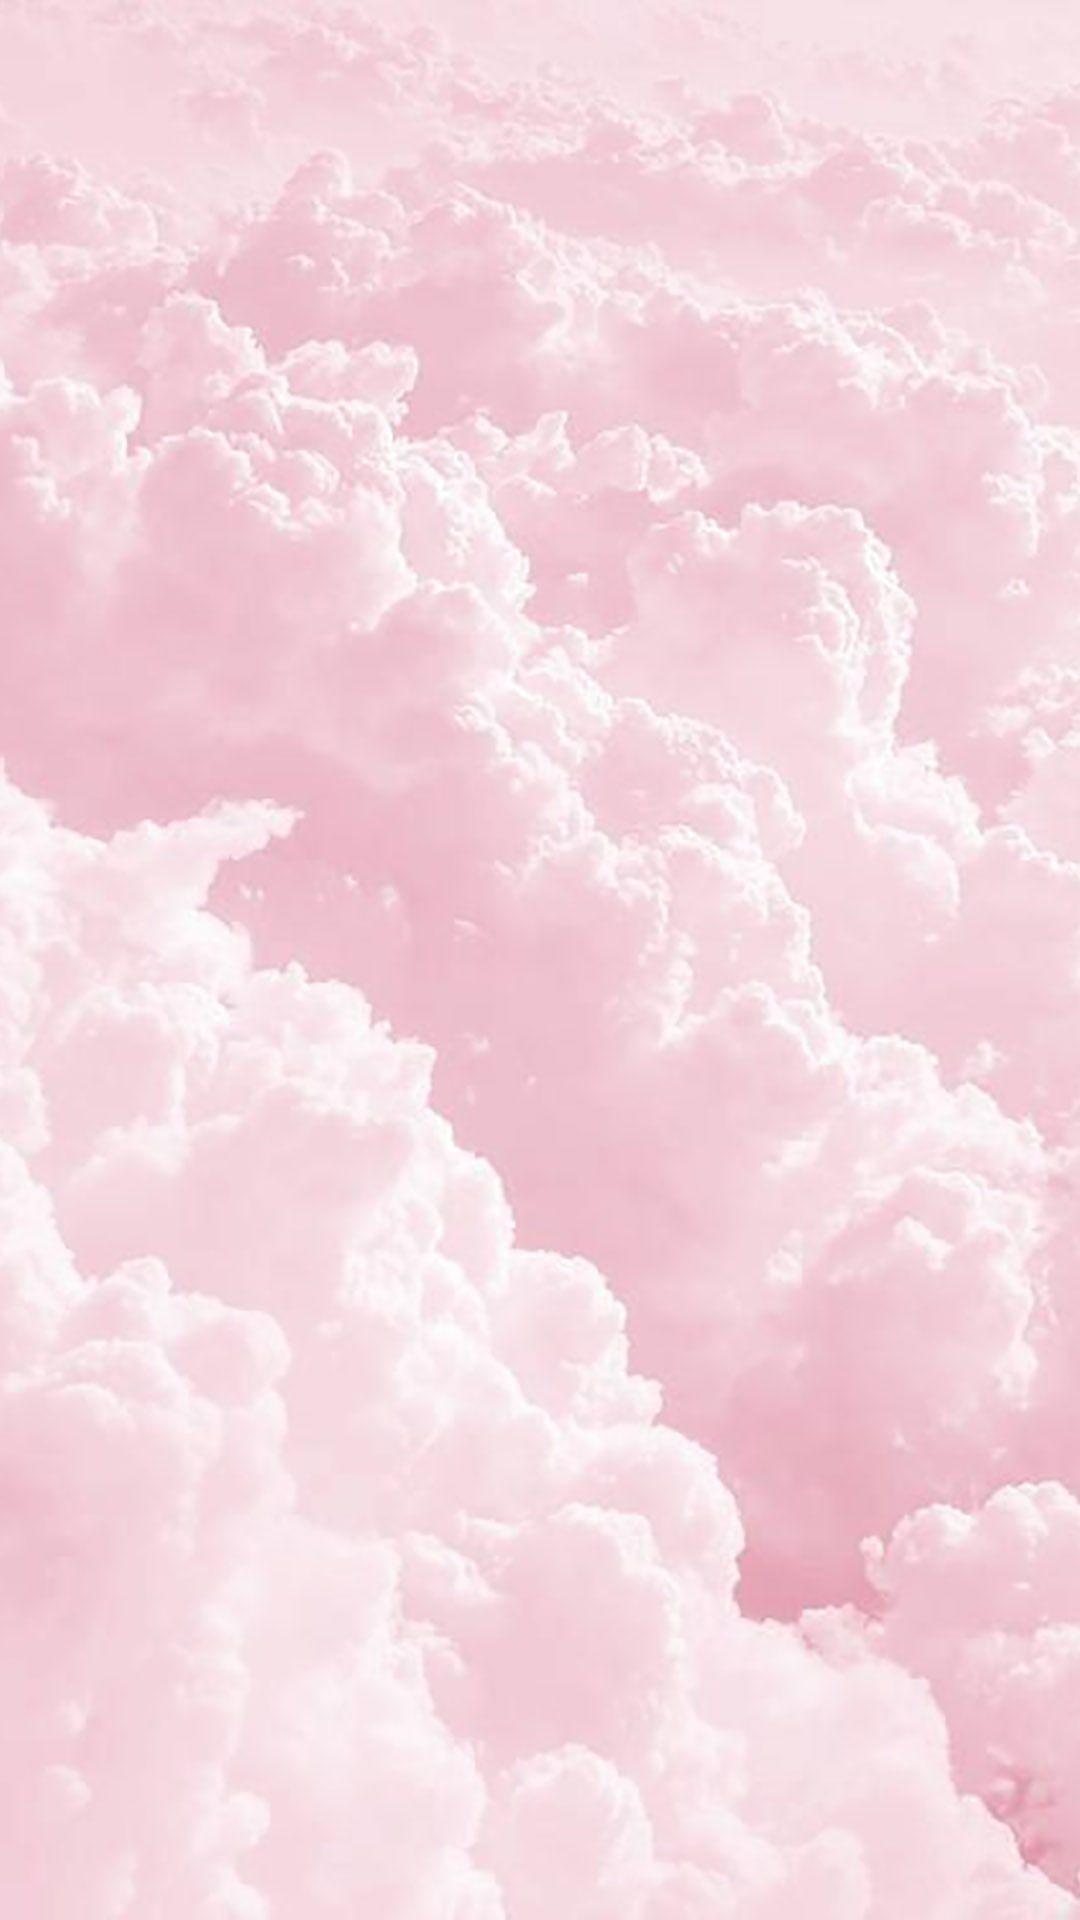 Wallpaper Ponsel Iphone Pink Wallpaper Ponsel Pink Clouds Wallpaper Cute Pastel Wallpaper Pastel Pink Aesthetic